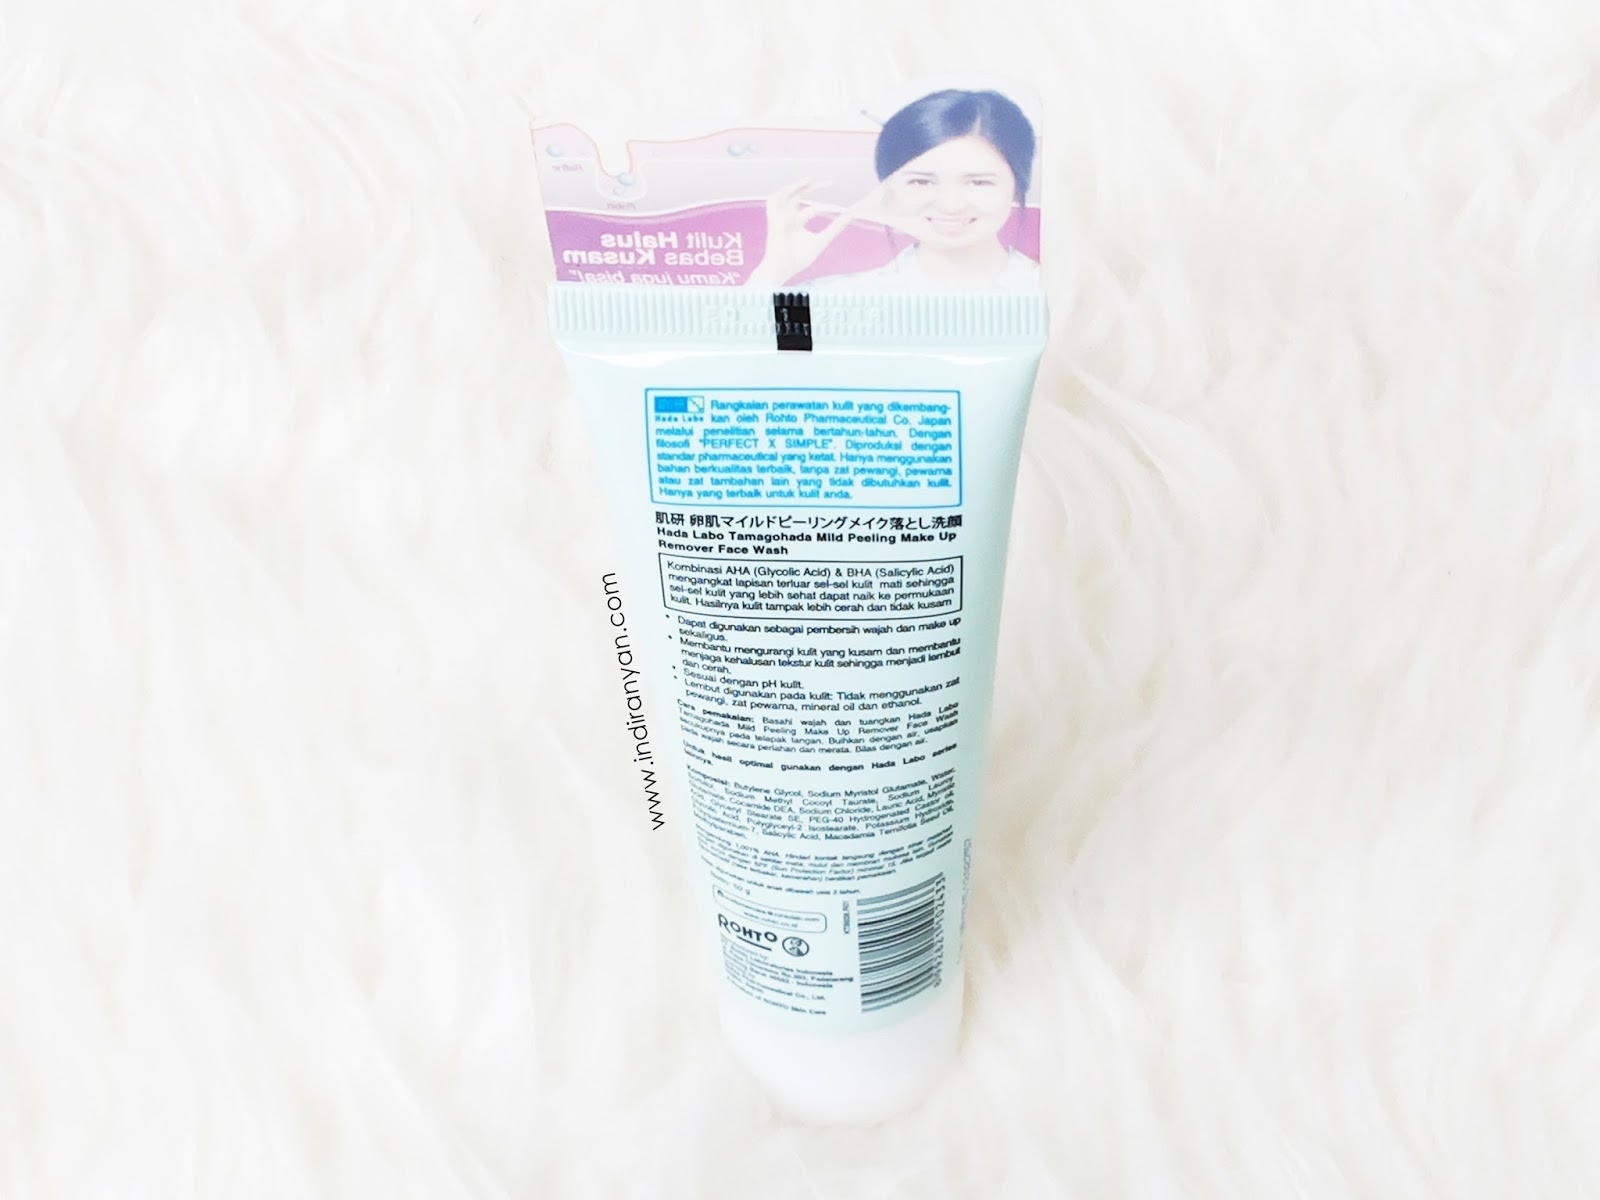 Hada-Labo-Tamagohada-Ultimate-Mild-Peeling-Face-Wash-Make-Up-Remover